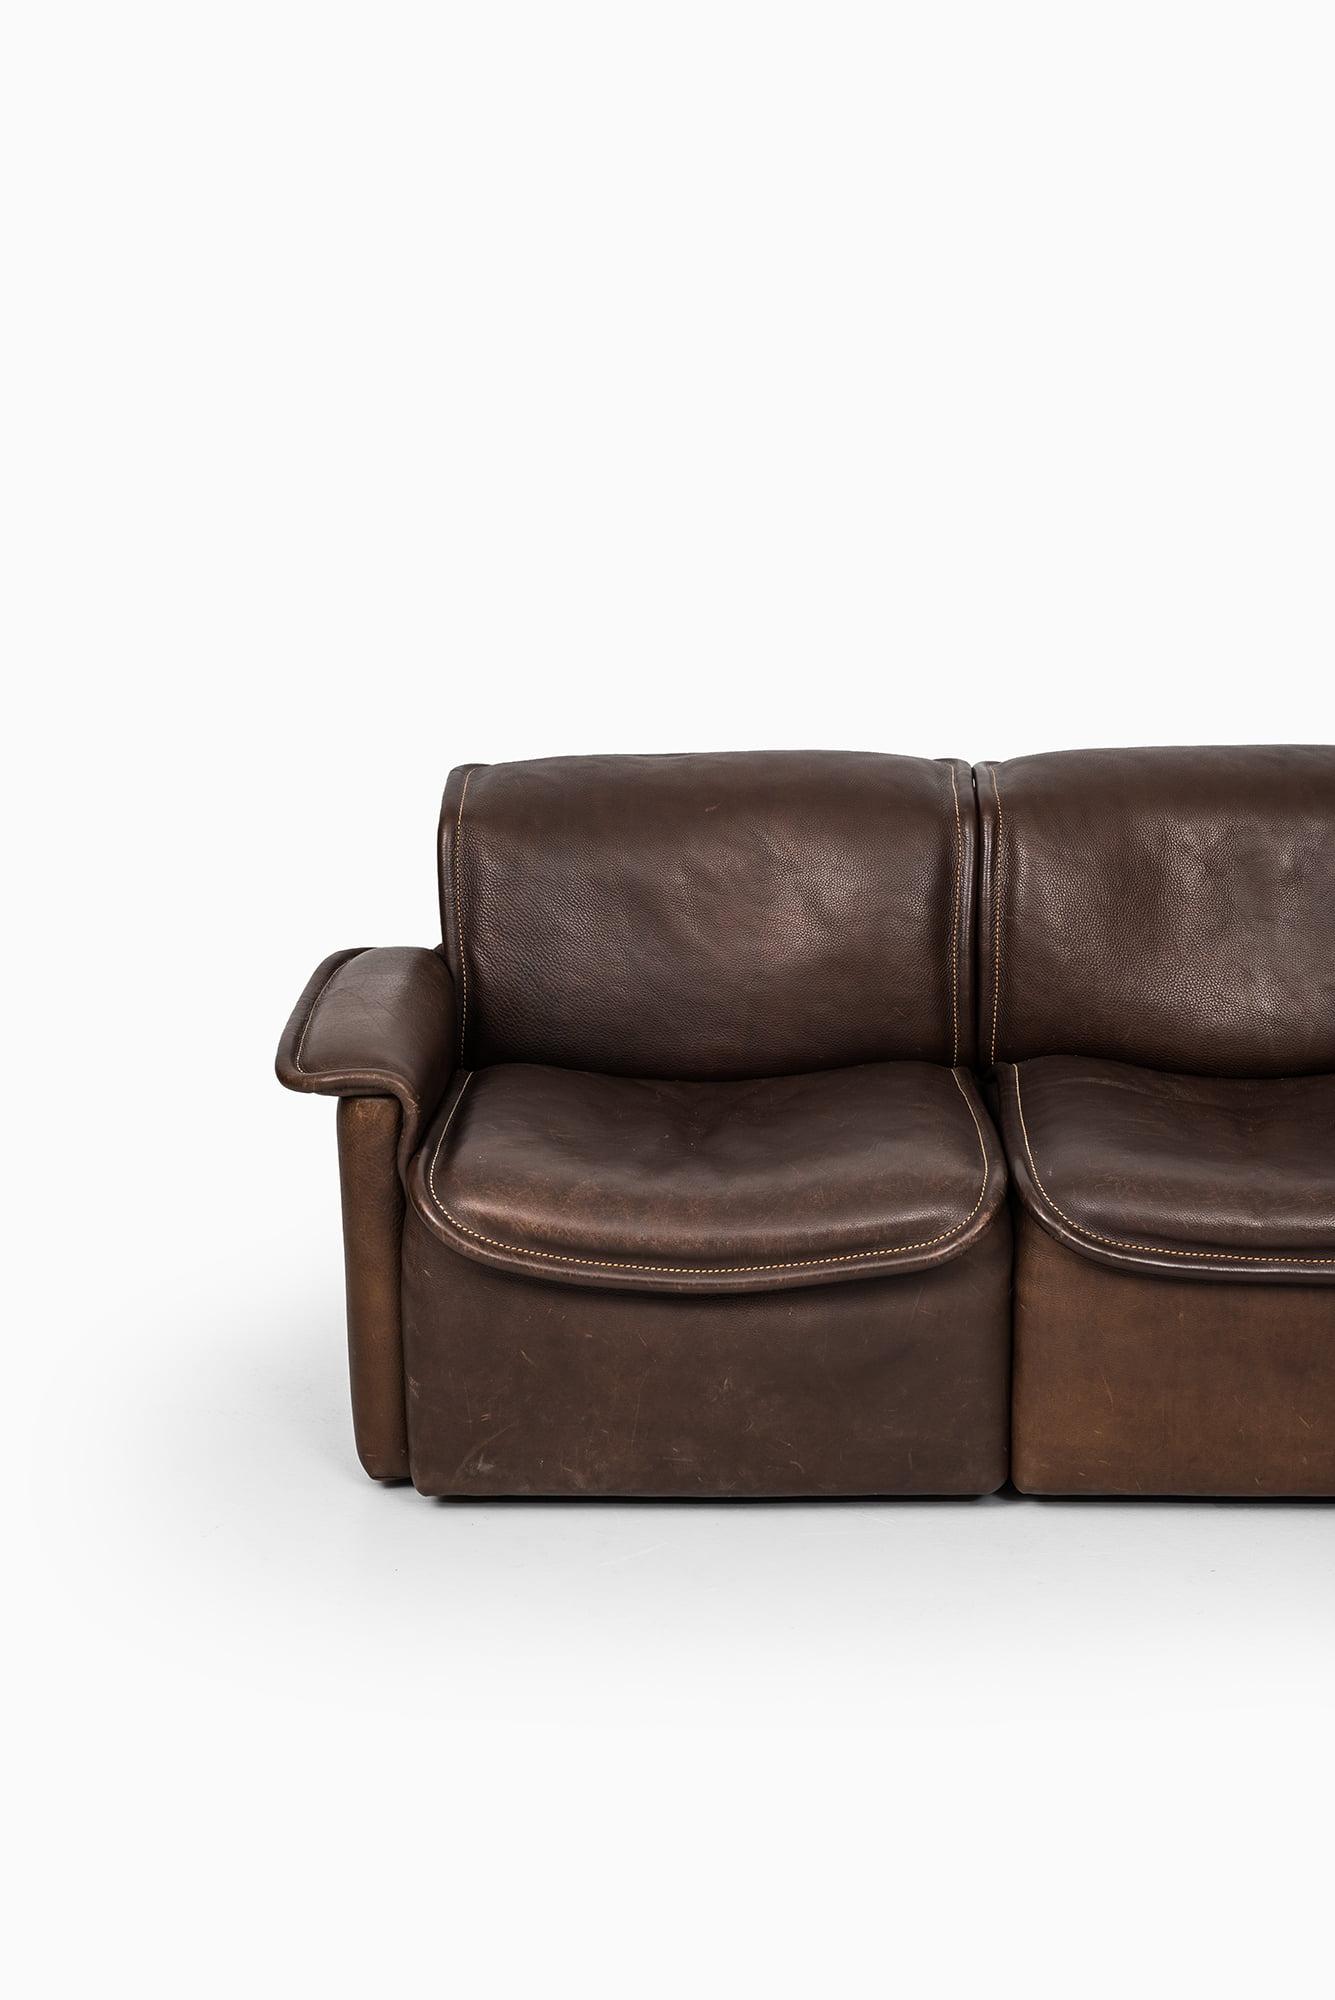 de sede sofa at studio schalling. Black Bedroom Furniture Sets. Home Design Ideas